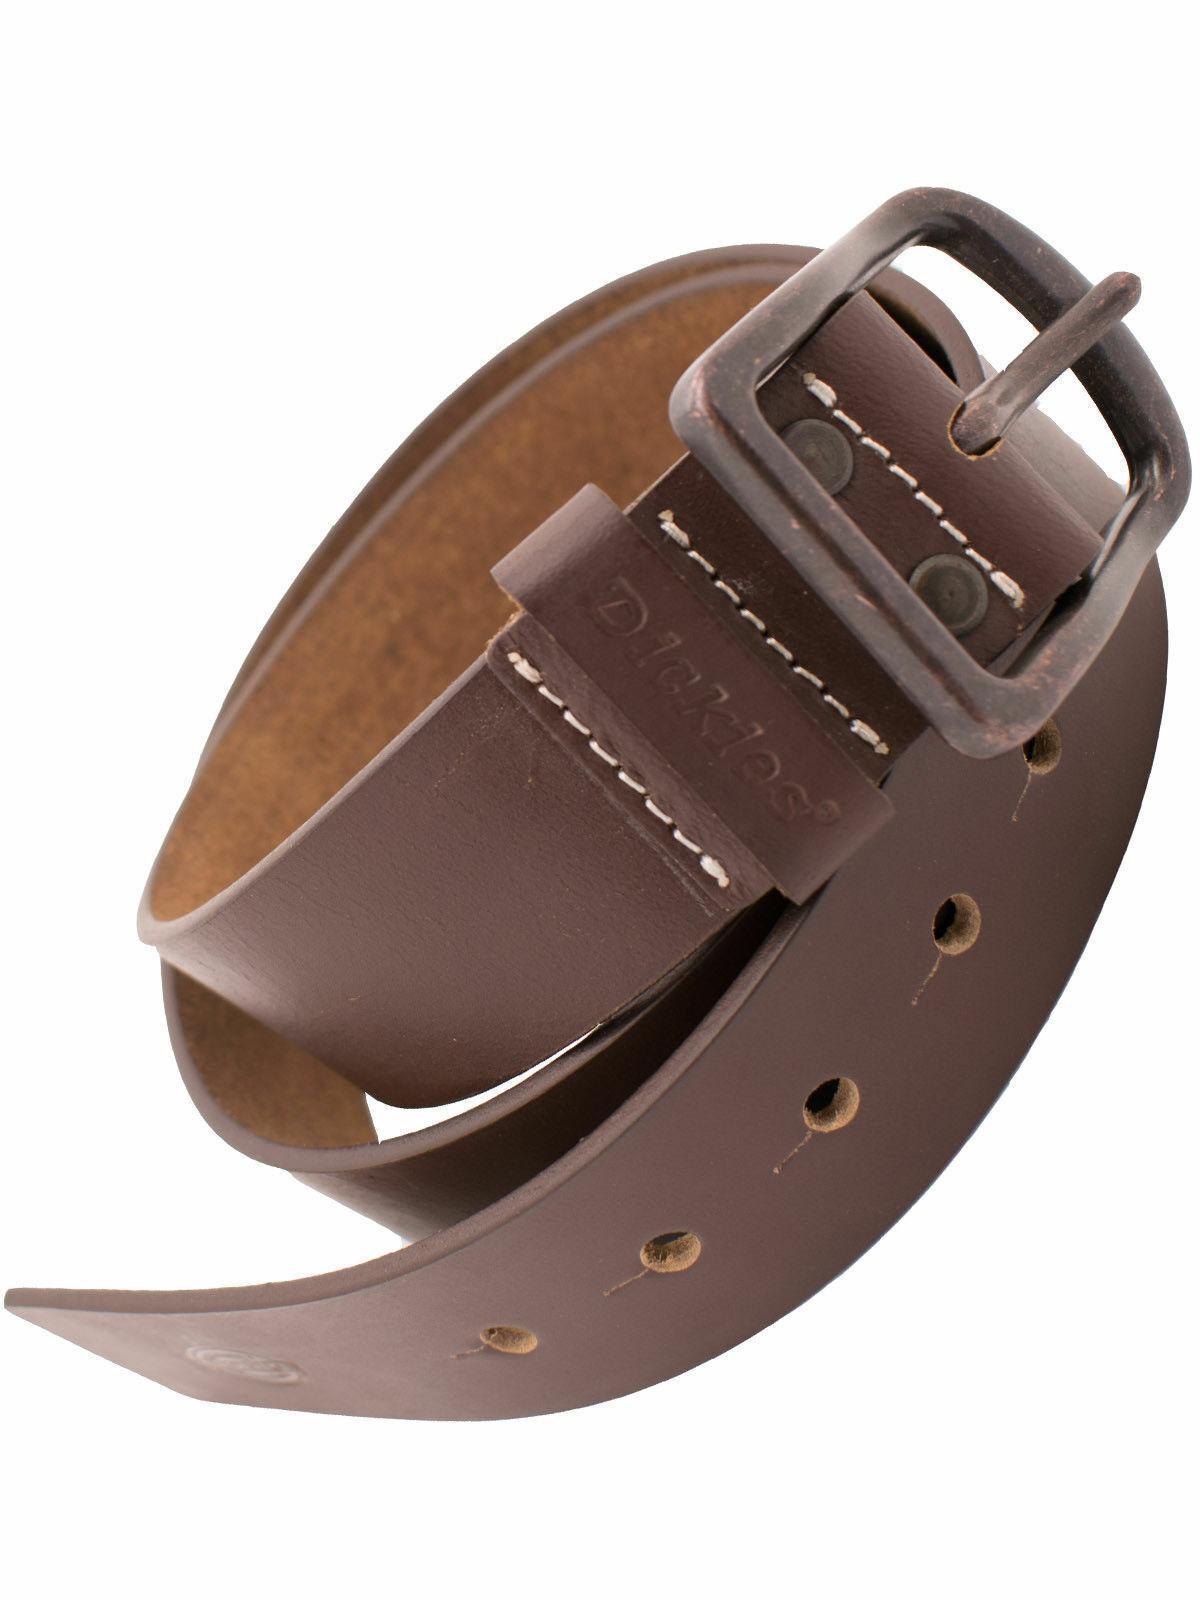 Dickies Herren Gürtel Helmsburg Brown Braun Belt Leder Ledergürtel 5038